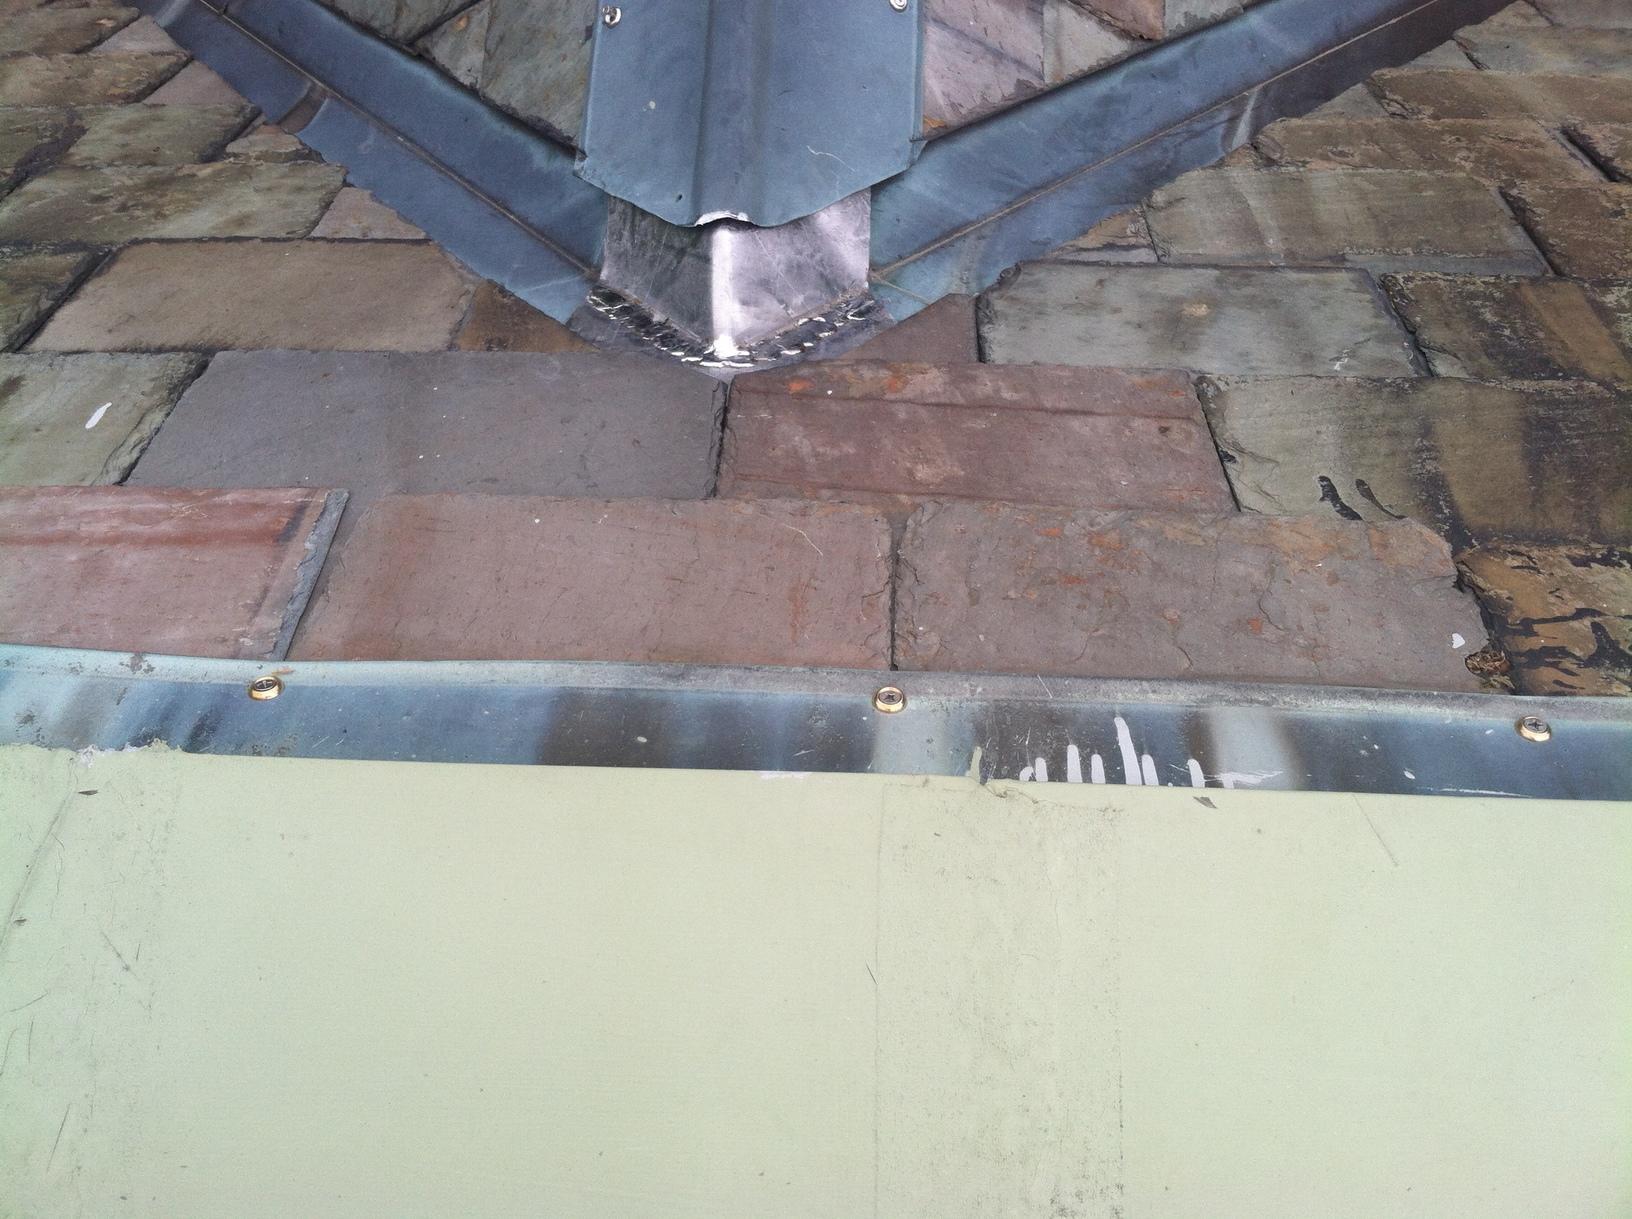 Slate Roof Leak Repair in Needham, MA - After Photo